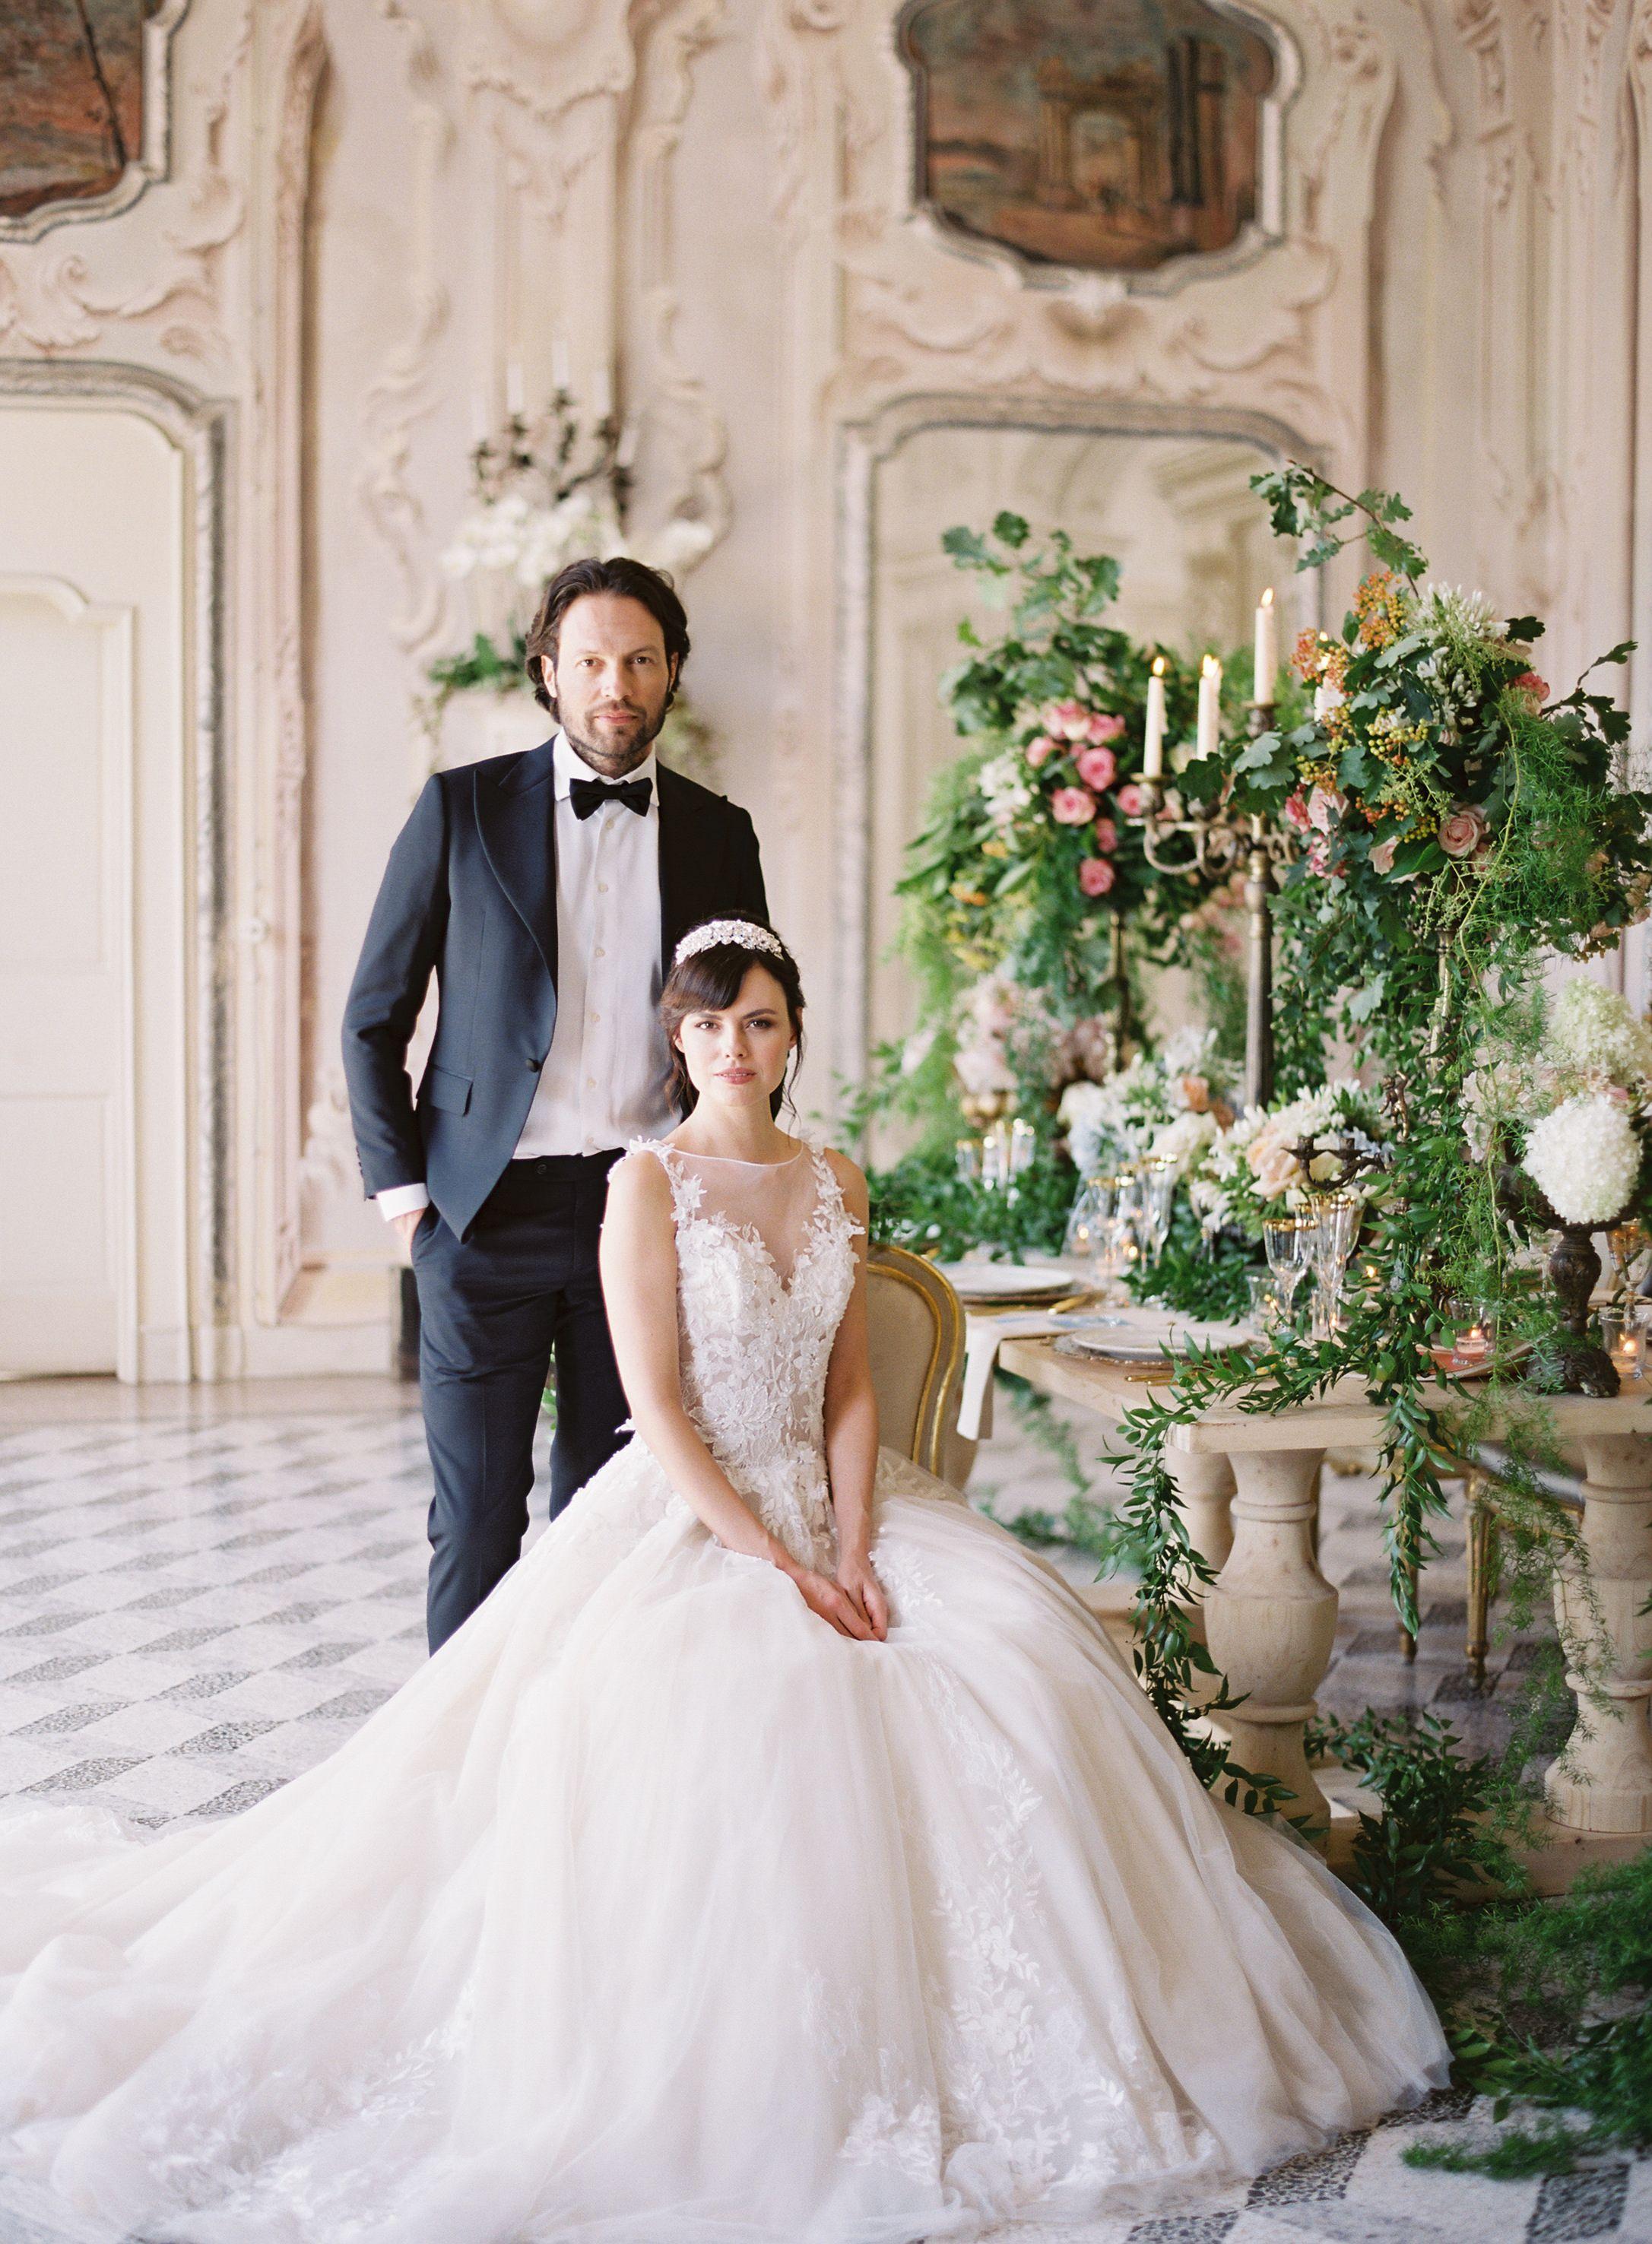 18th century wedding dress  Inspired by th Century Opulence and Lake Como Views  Lake como